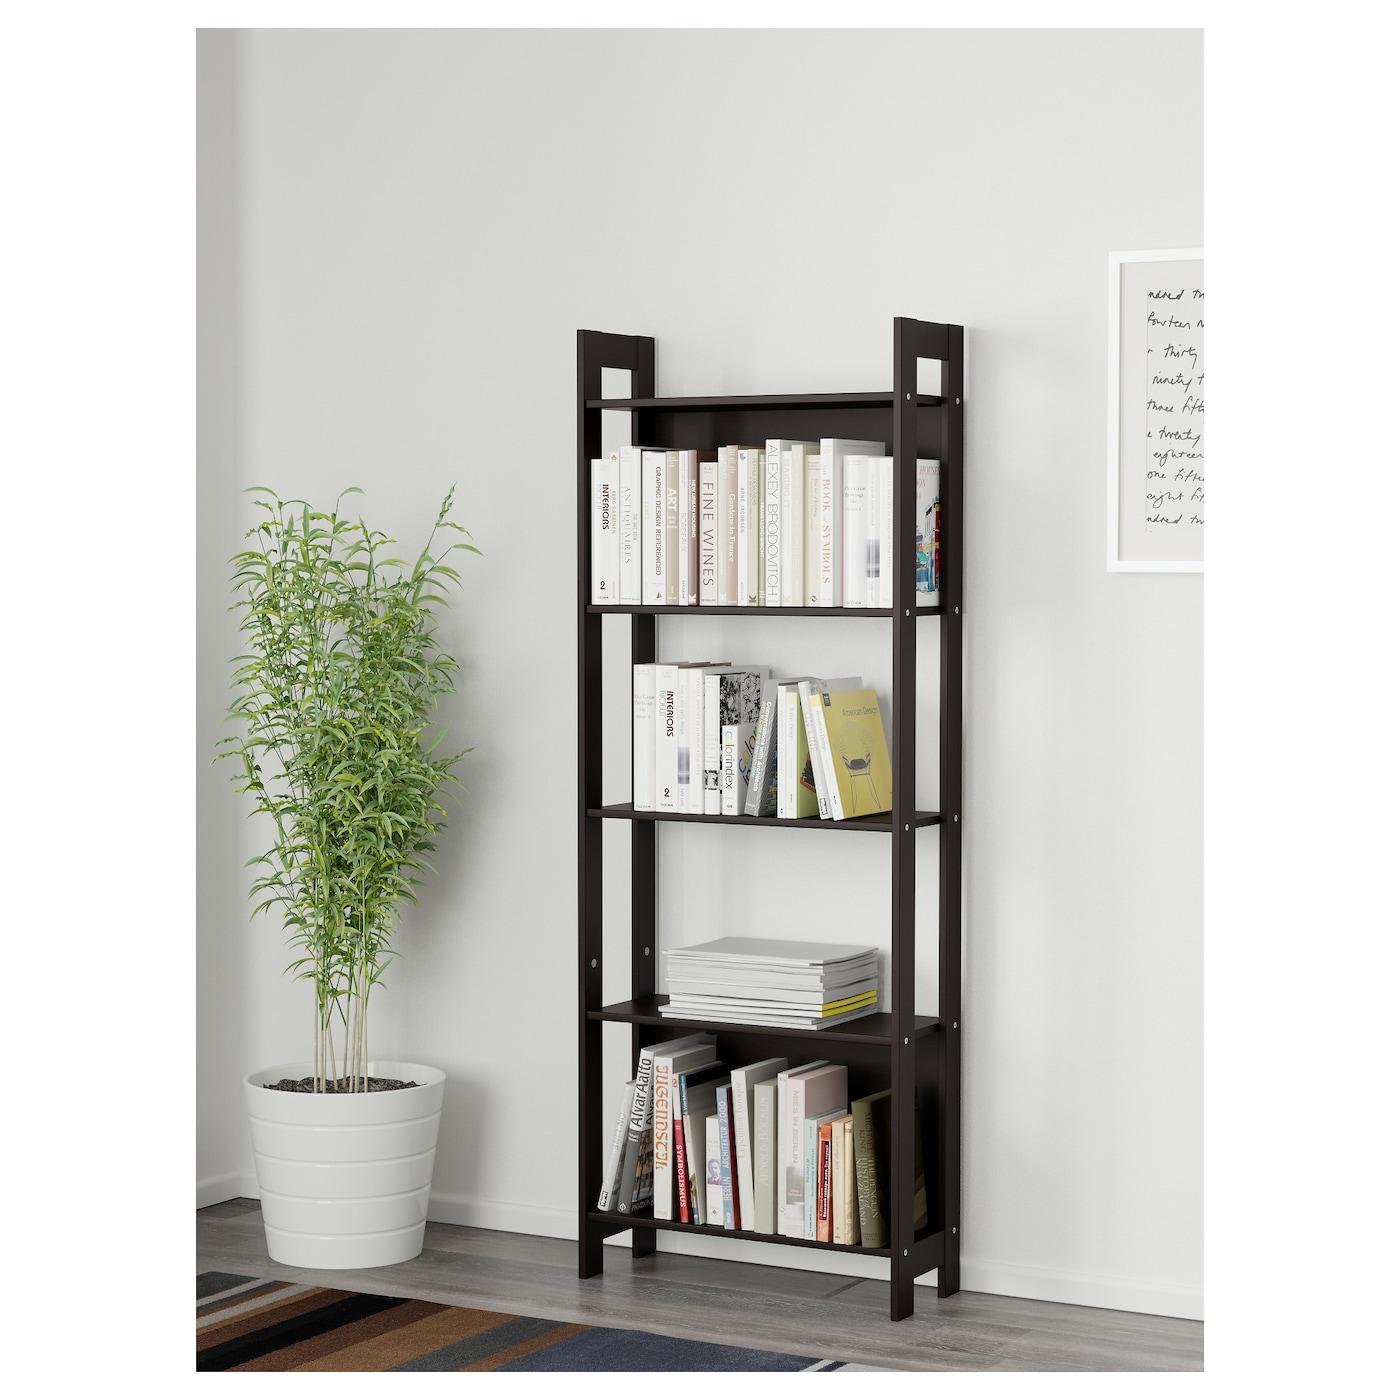 LAIVA bookcase image